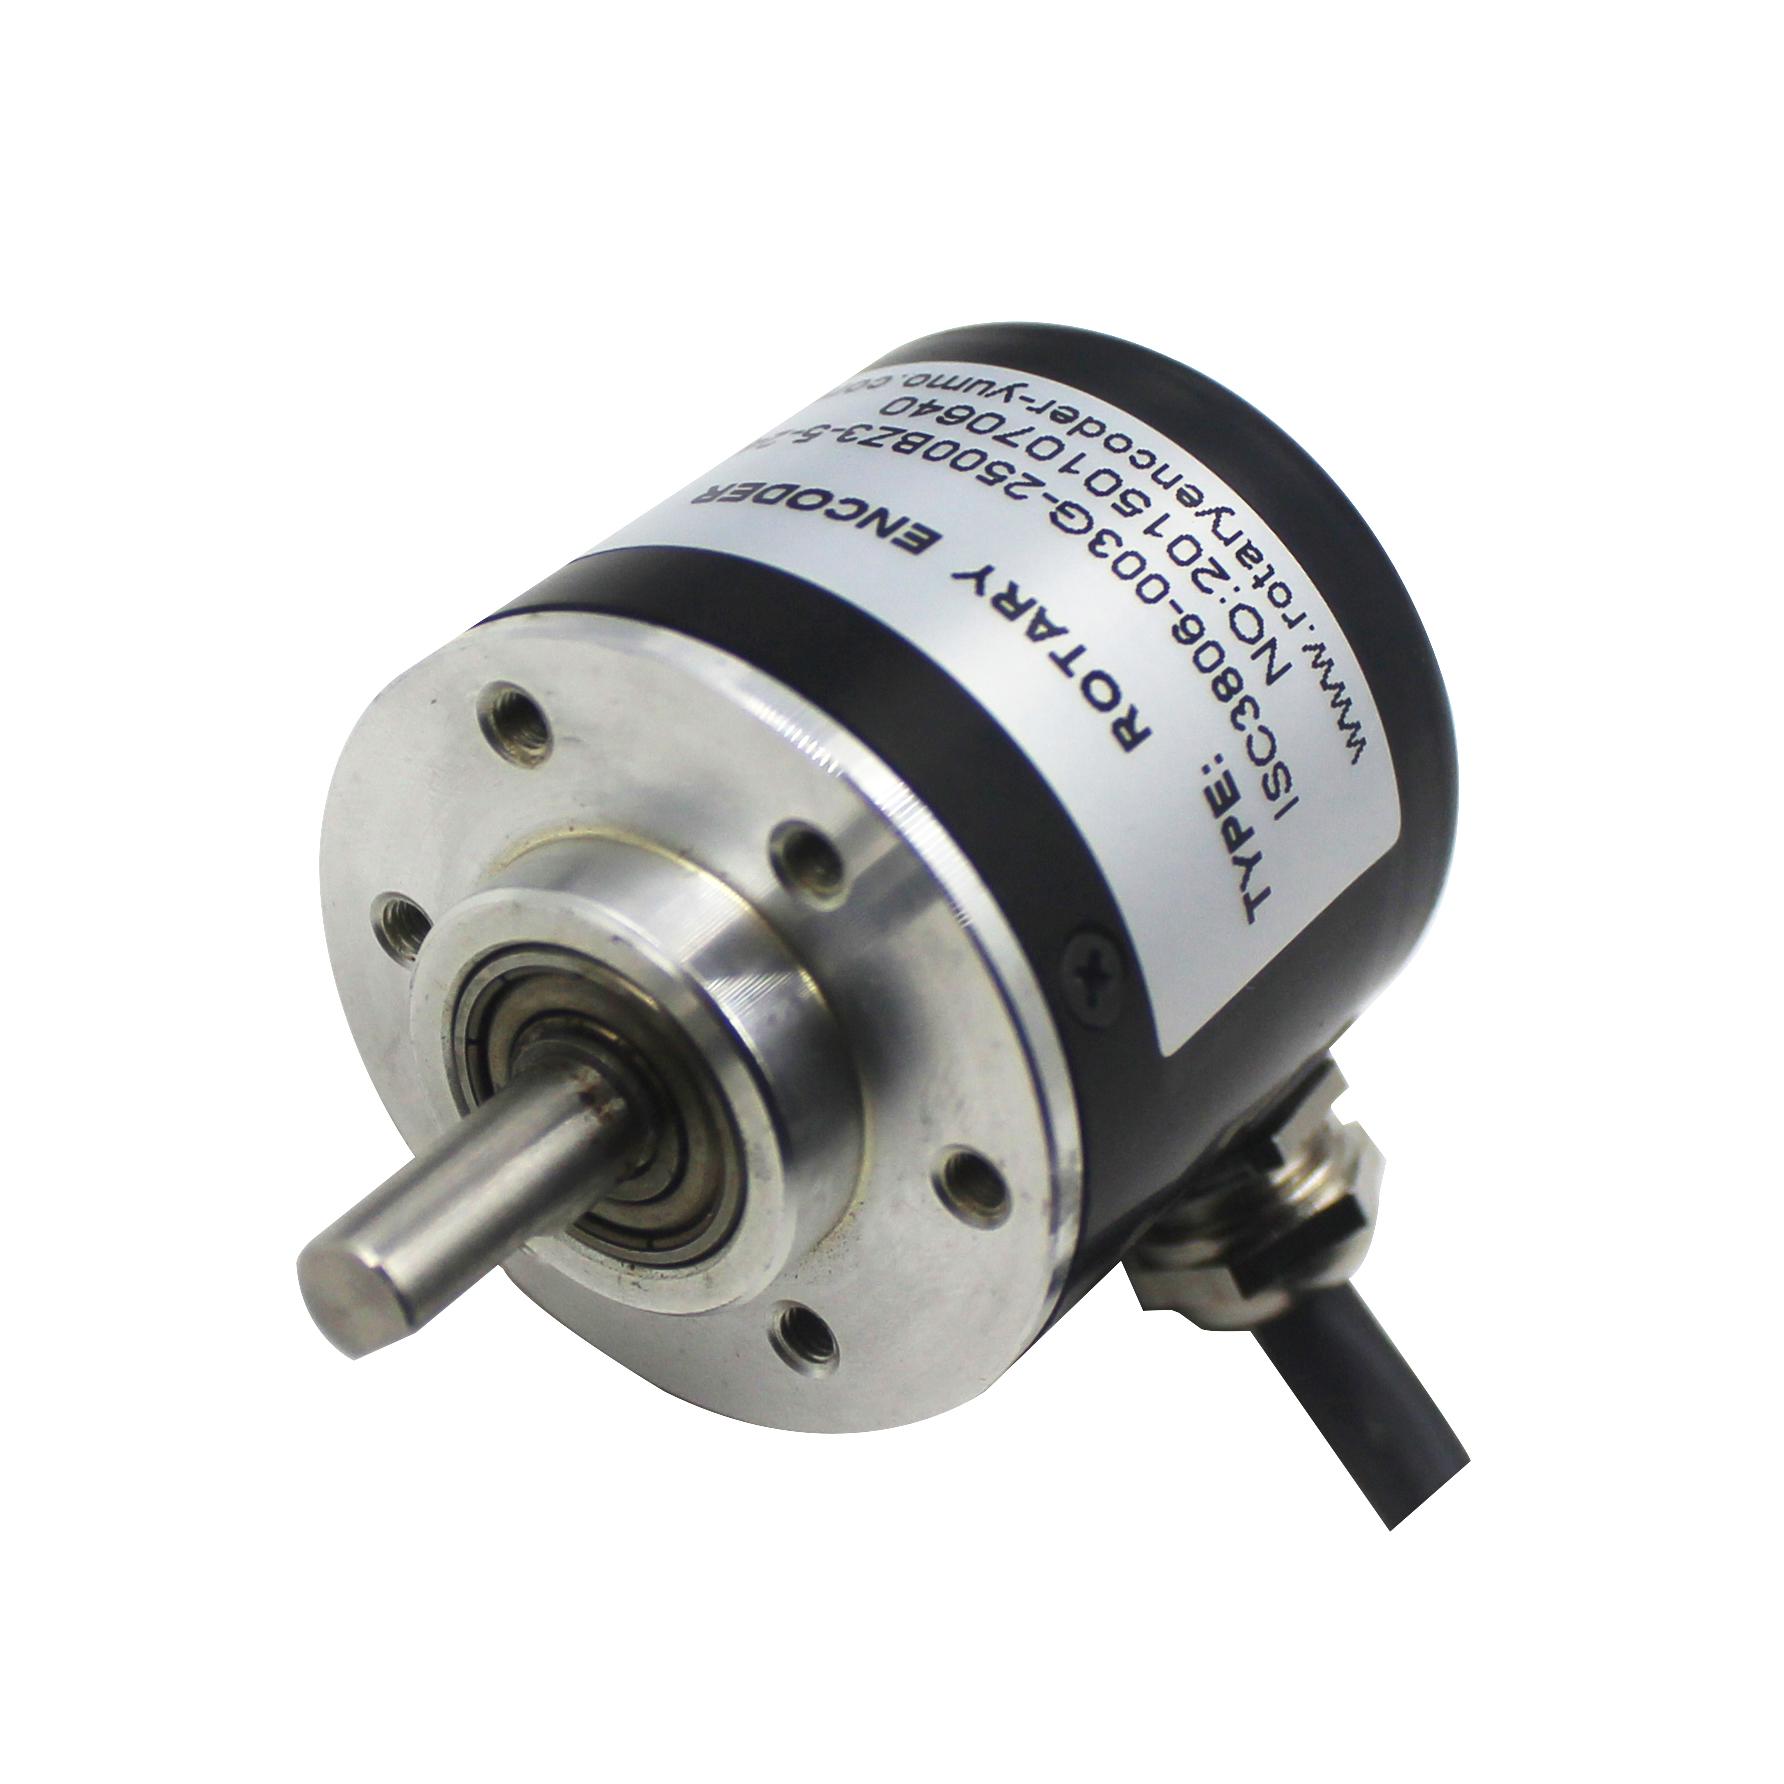 China a b z phase rotary encoder ppr